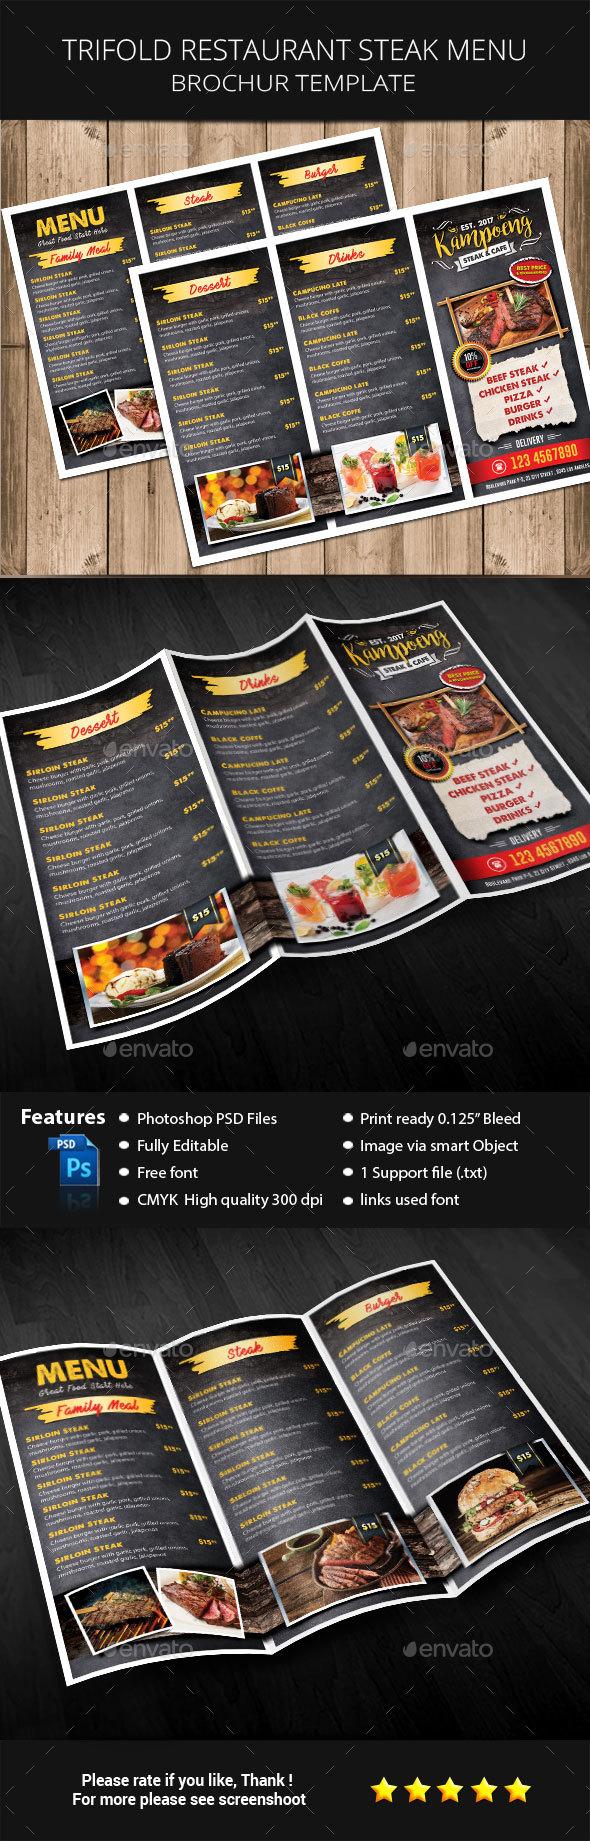 Trifold Restaurant Steak Menu - Restaurant Flyers